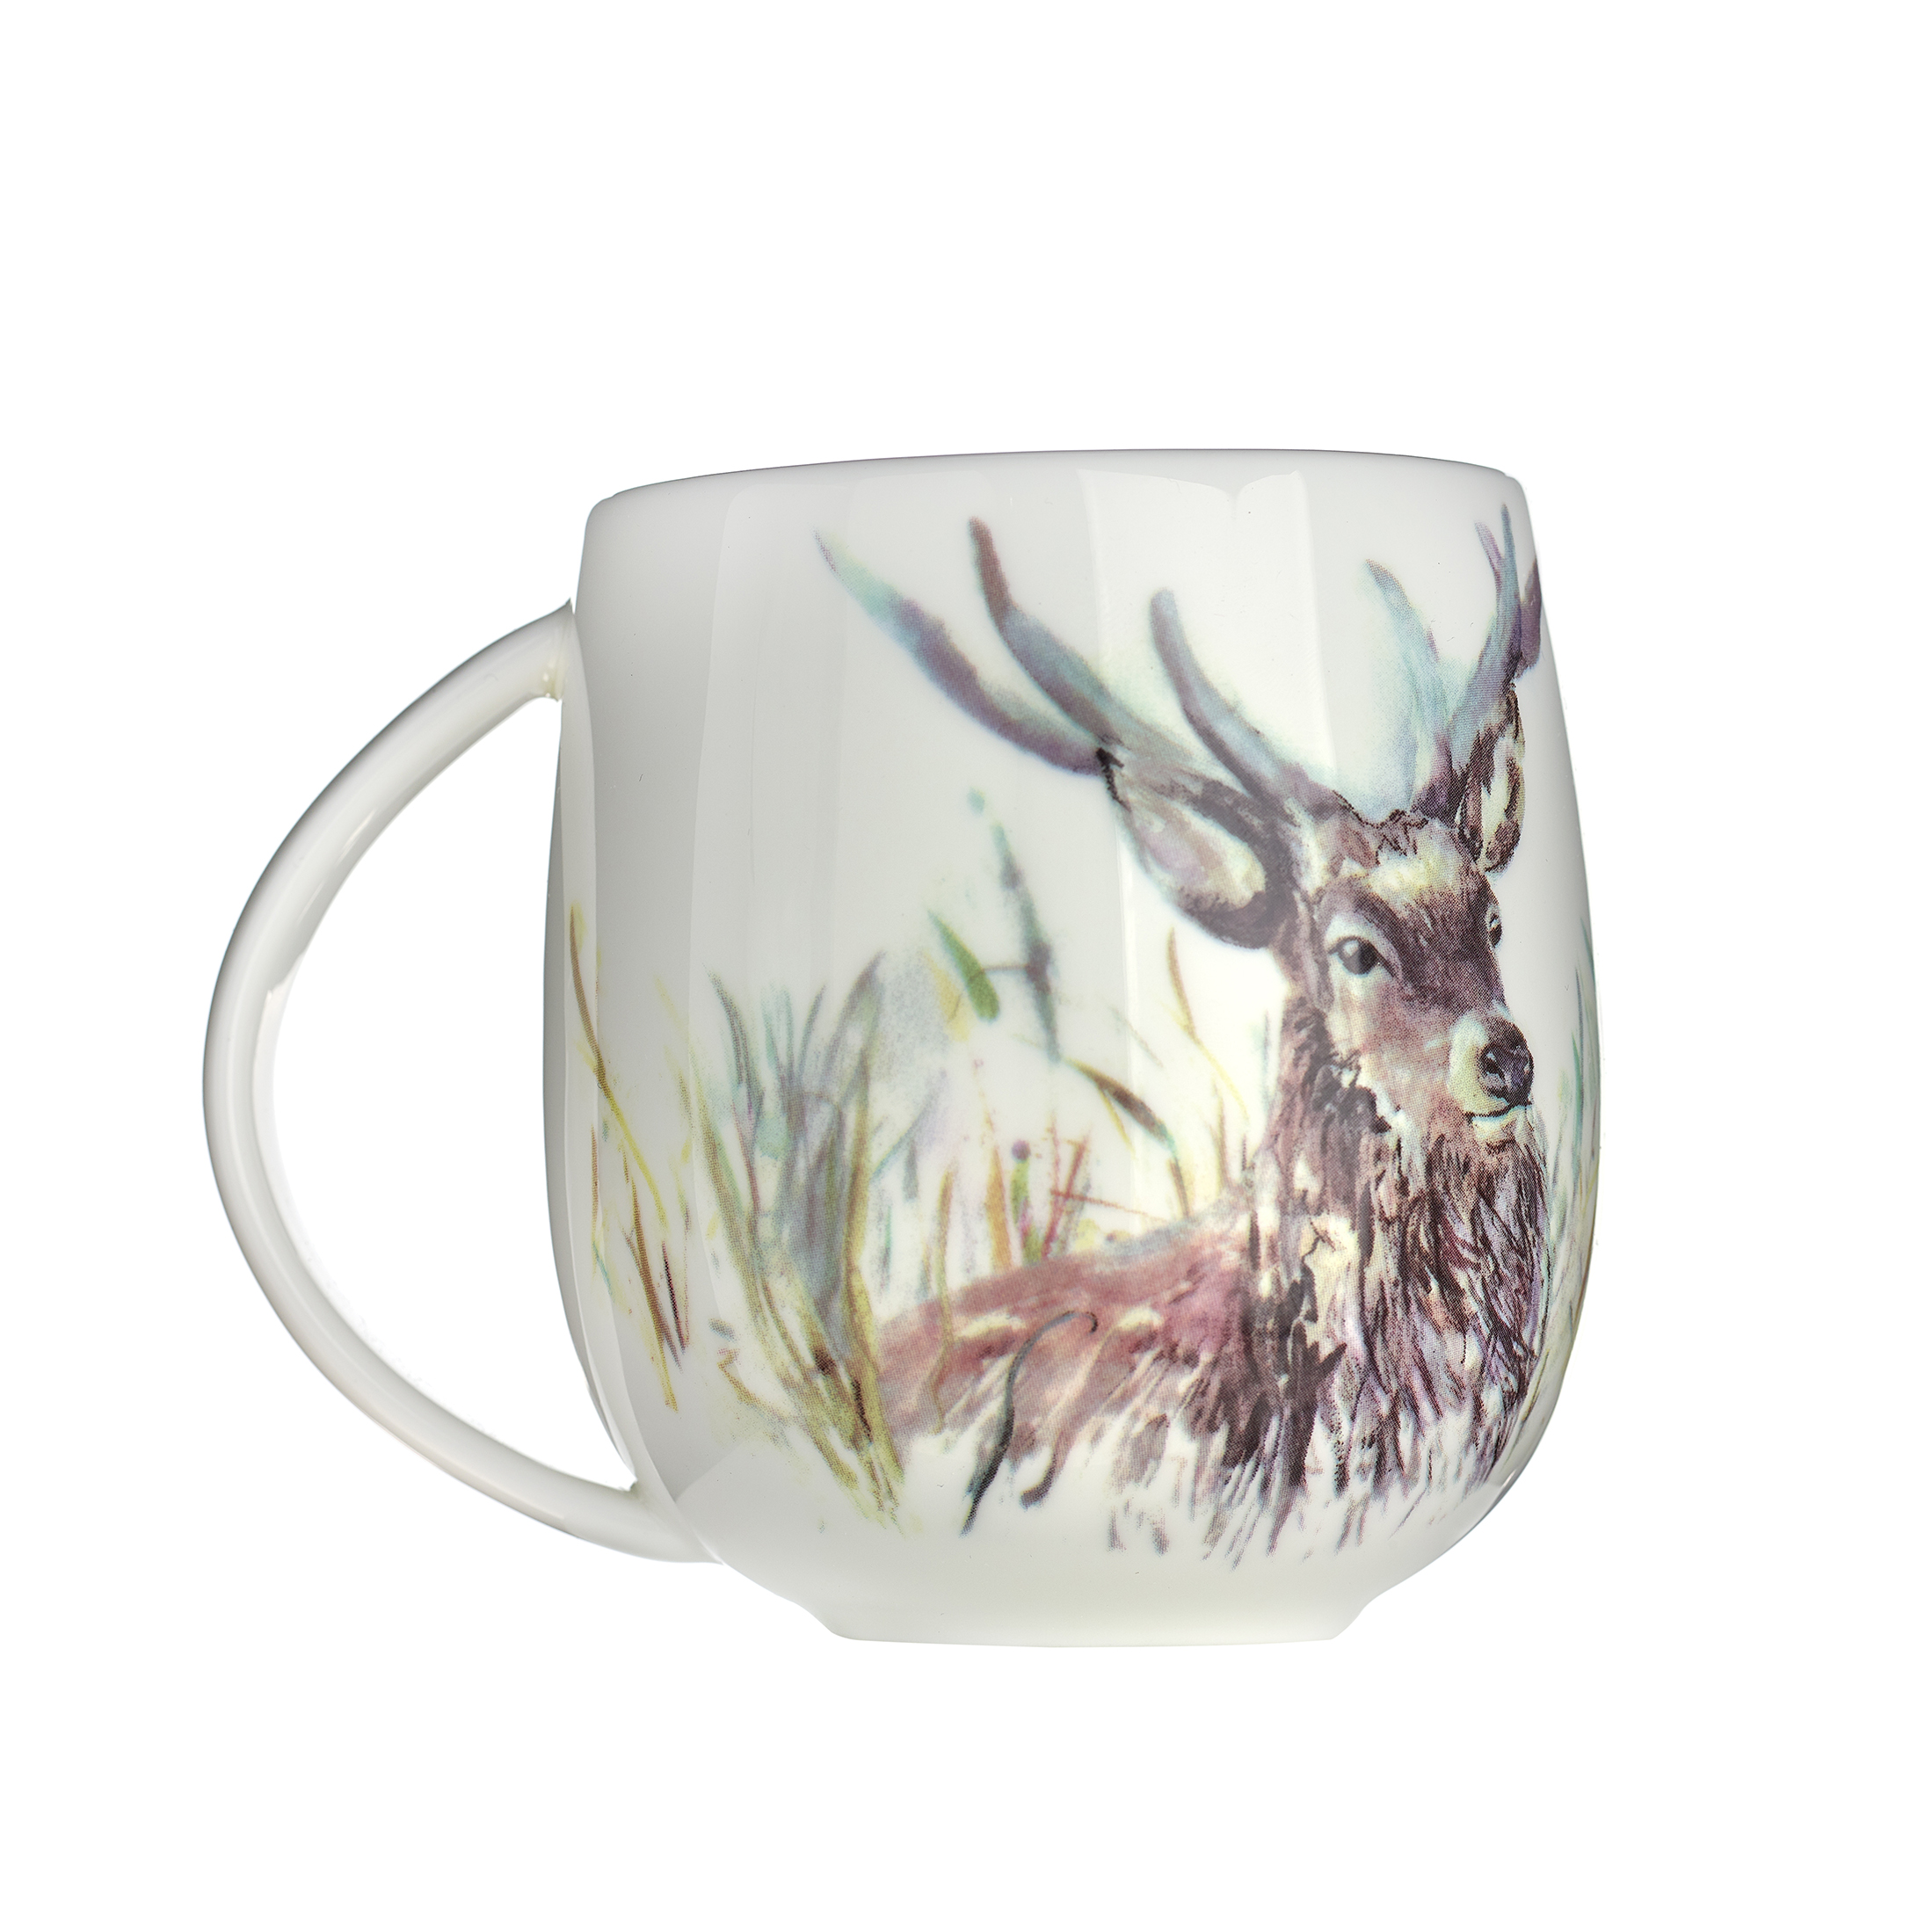 Stag Mug 10(h) x 11.4(w) x 8.2cm(d)